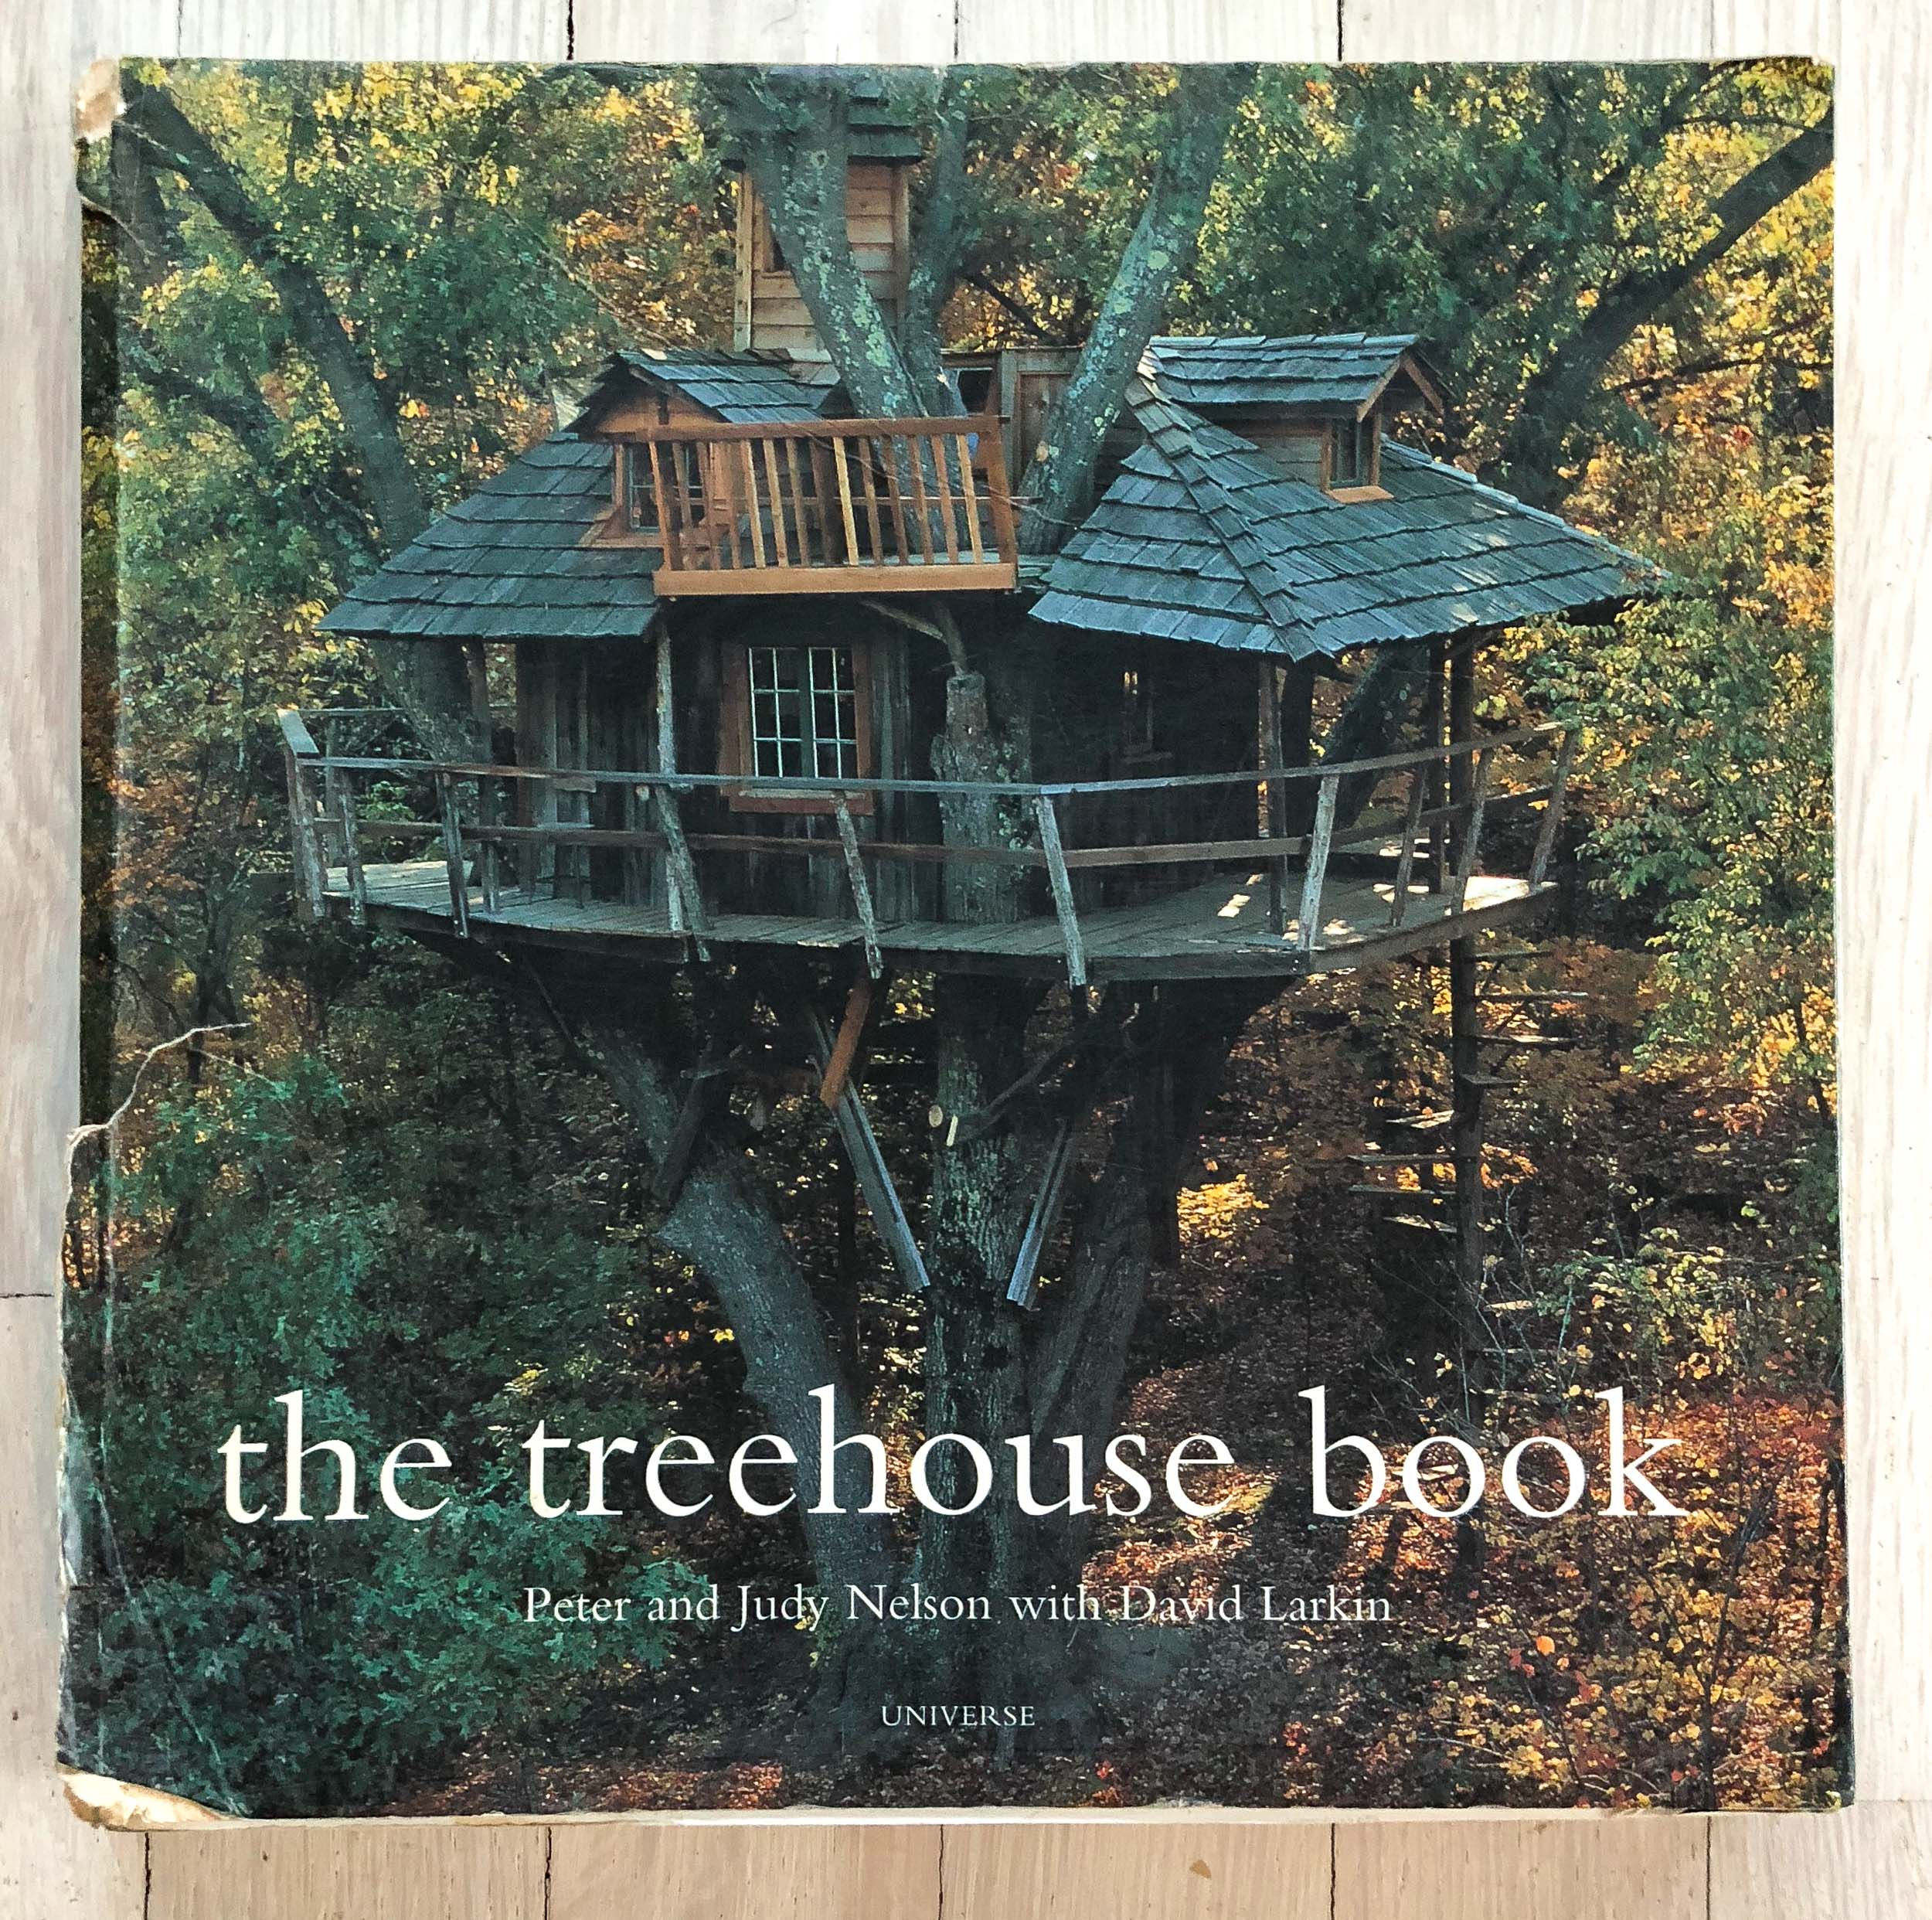 The Treehouse Book  by David Larkin. Edited by Richard Olsen. David Larkin, Graphic Design. Michael Vagnetti, Production Manager. Universe Publishing.